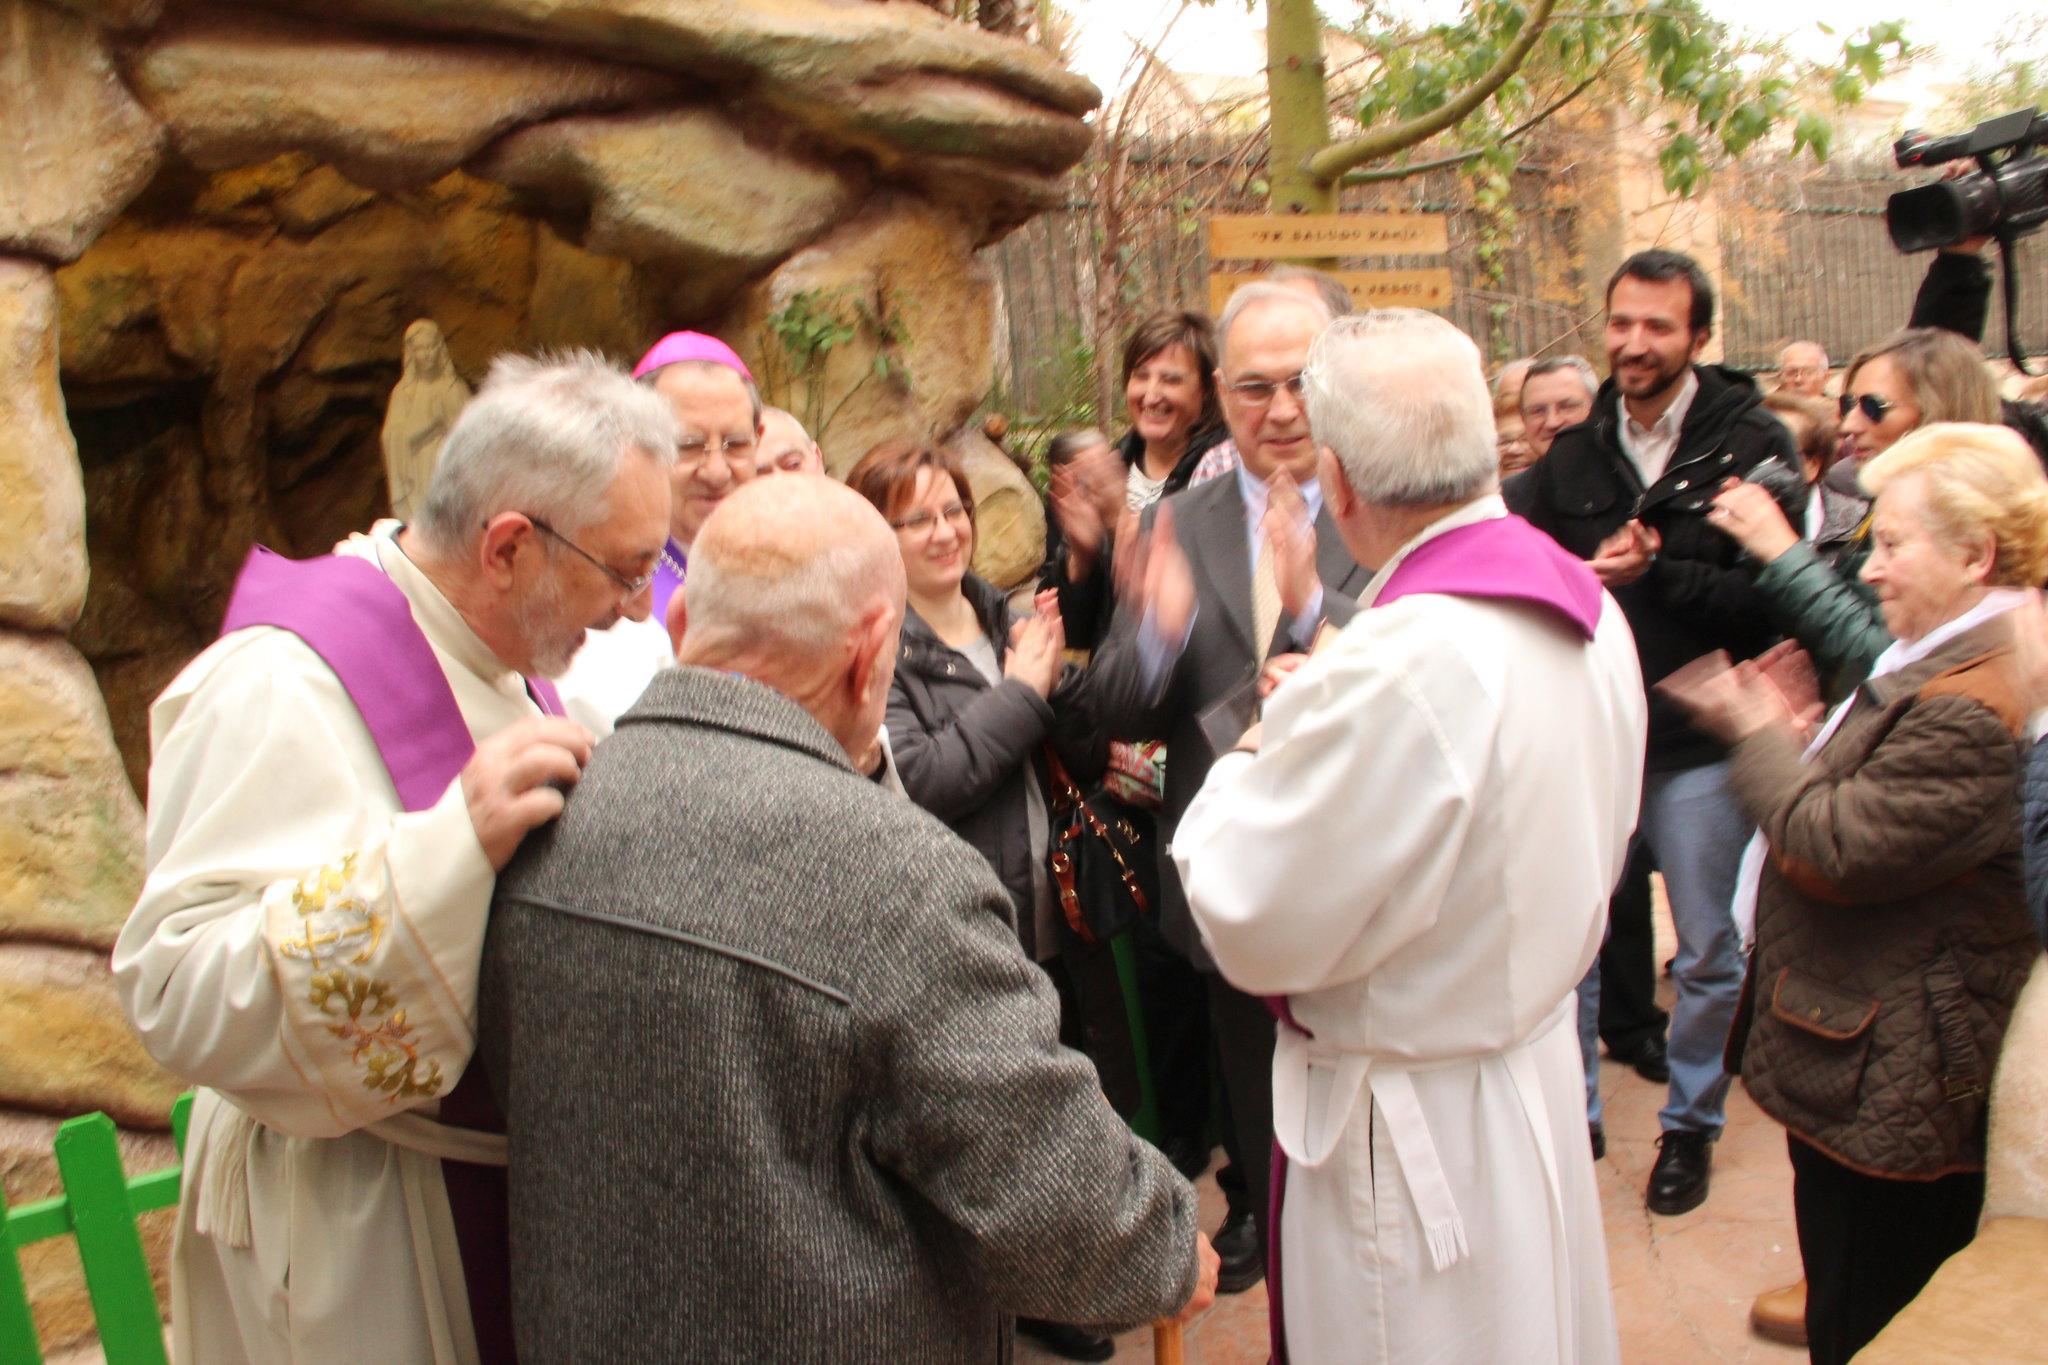 (2016-02-13) - Inauguración Virgen De Lourdes, La Molineta - Archivo La Molineta (086)